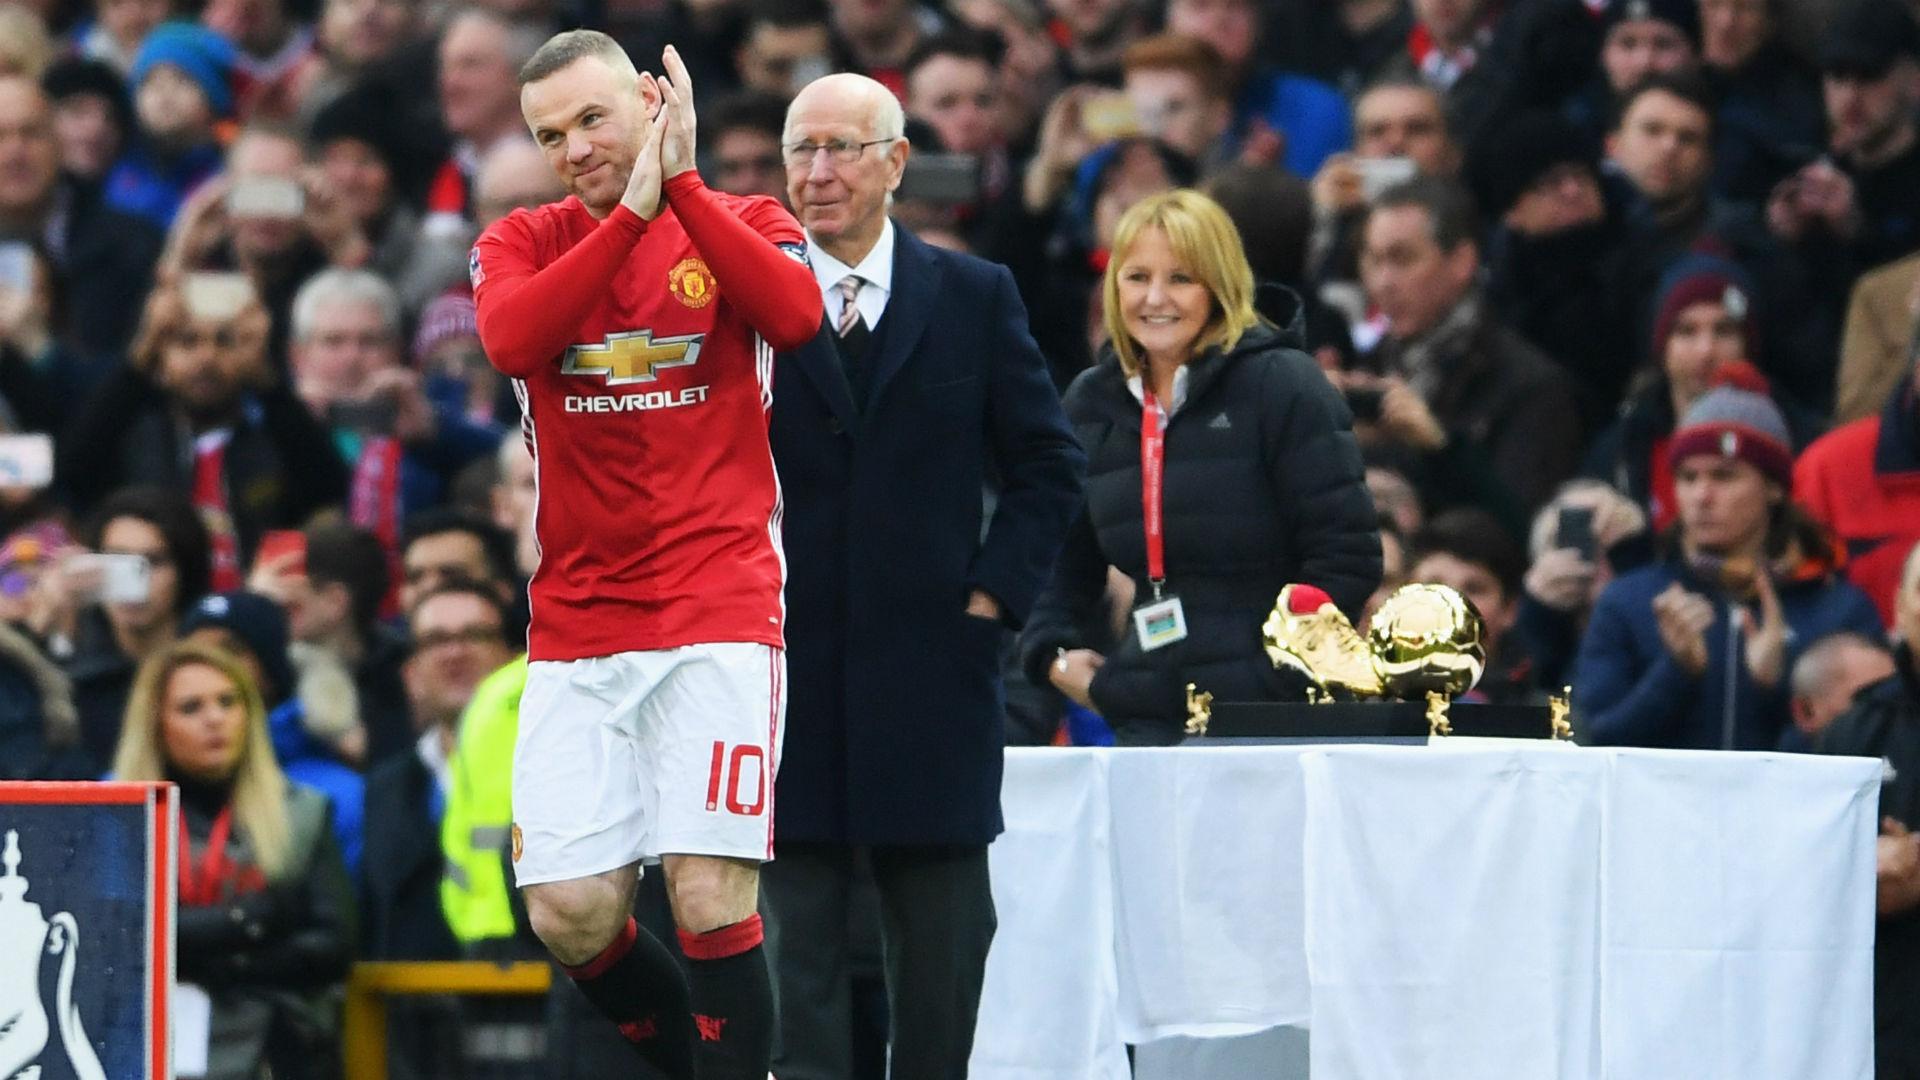 Shanghai FA denies bid for Rooney